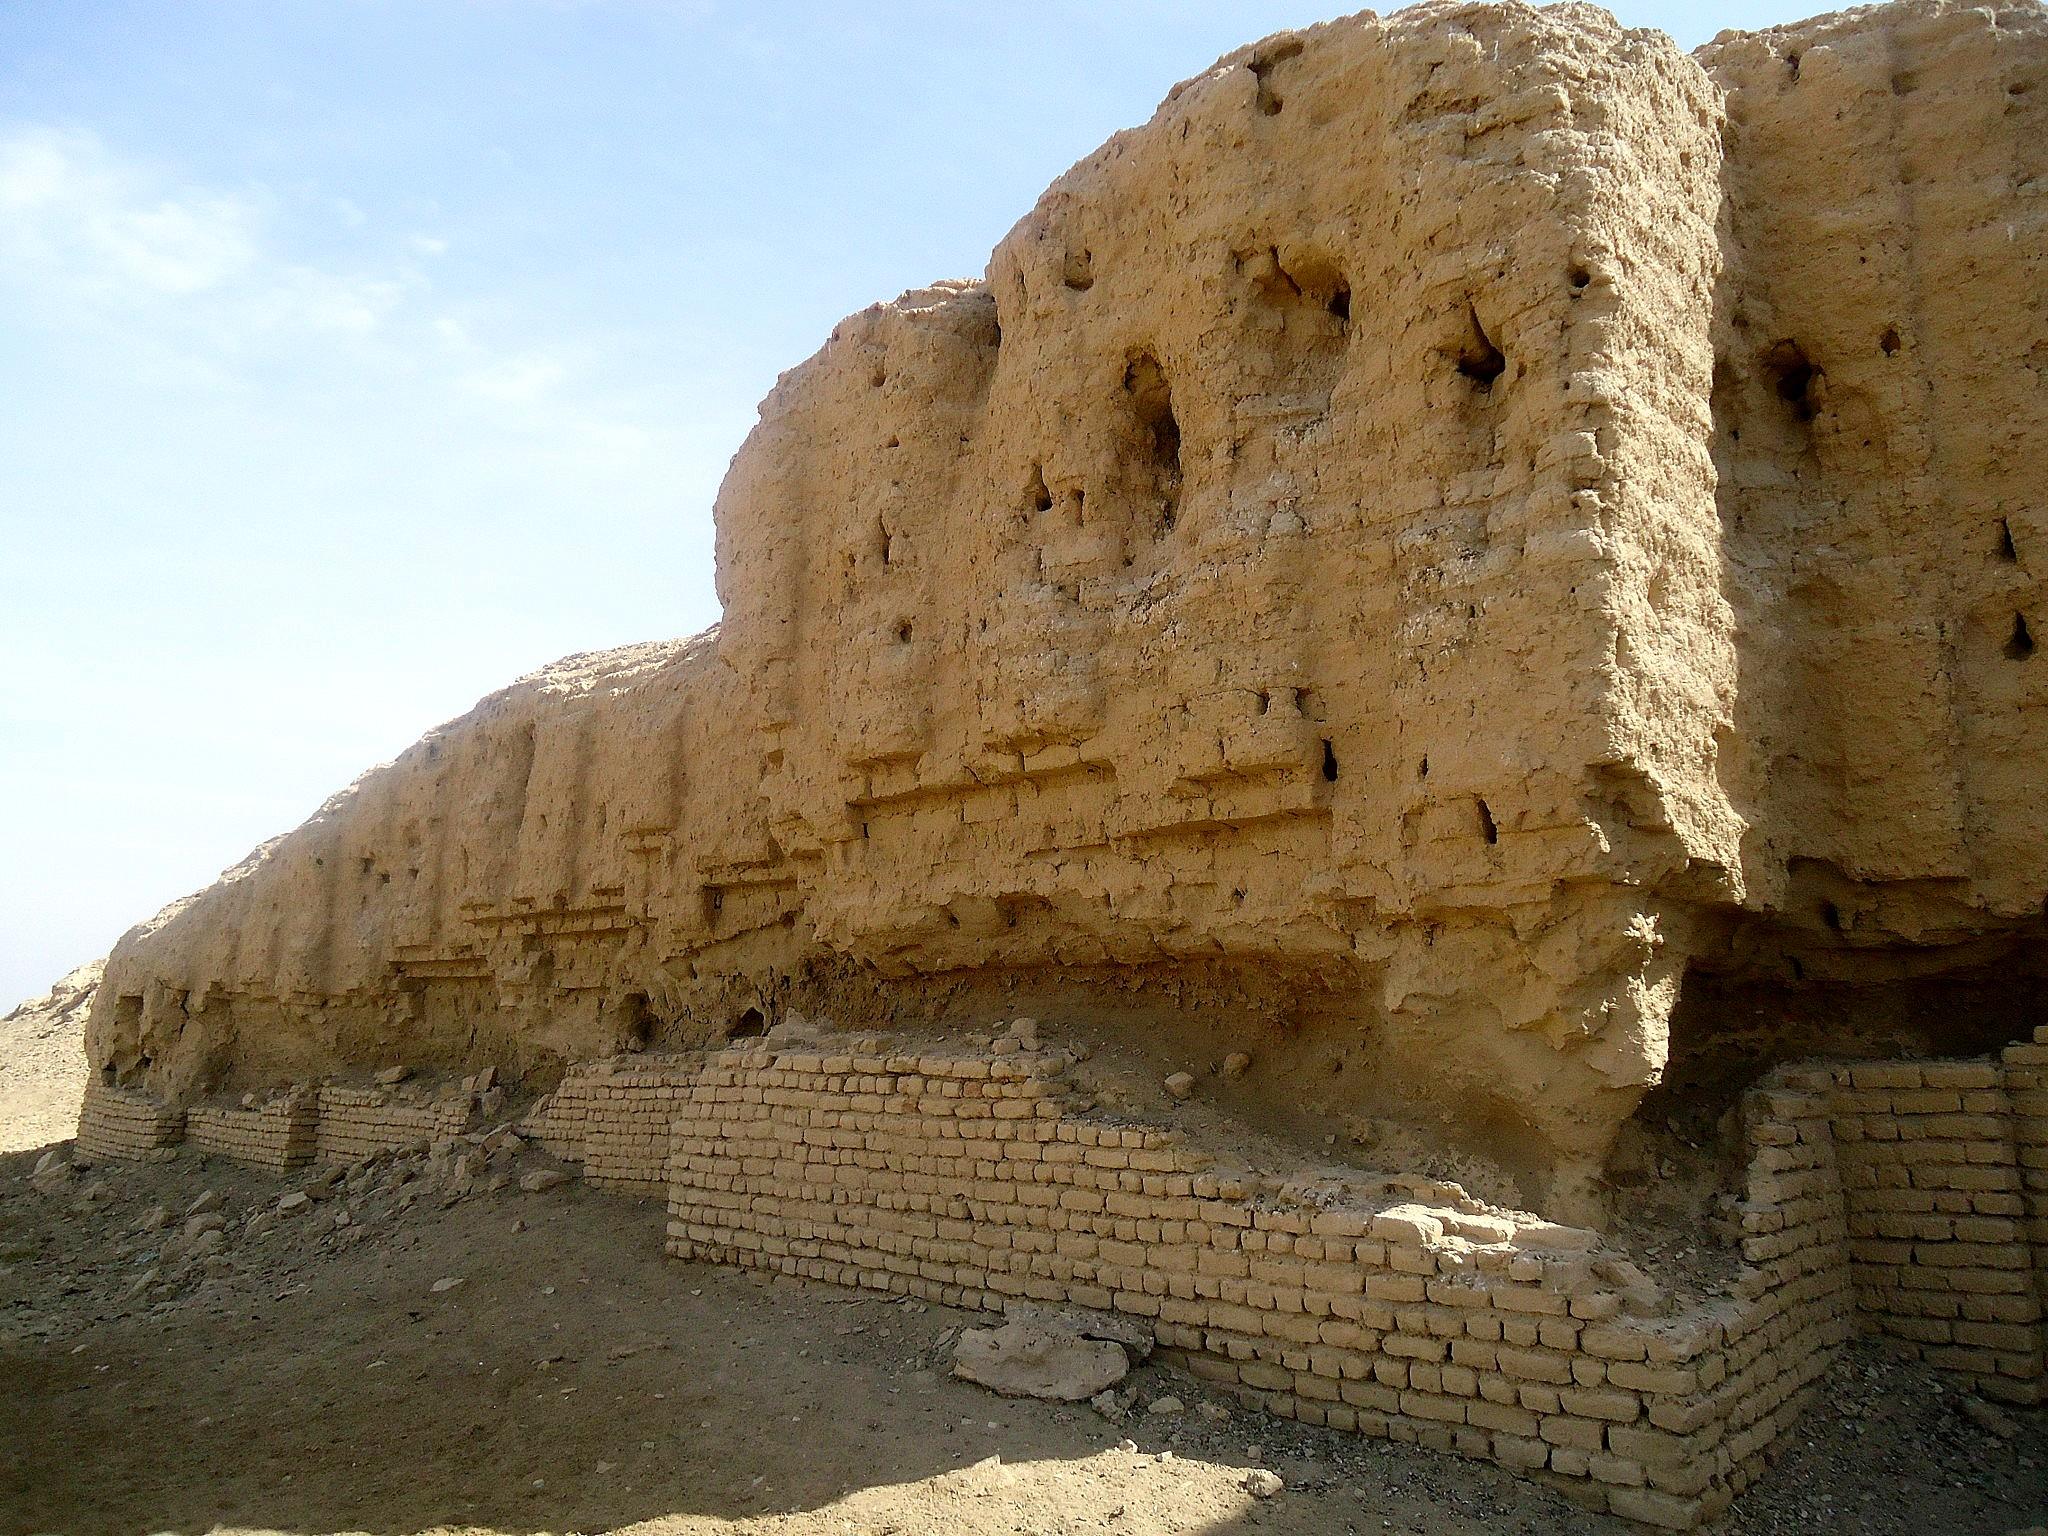 File:The ziggurat of Kish, Tell al-Uhaymir, Mesopotamia